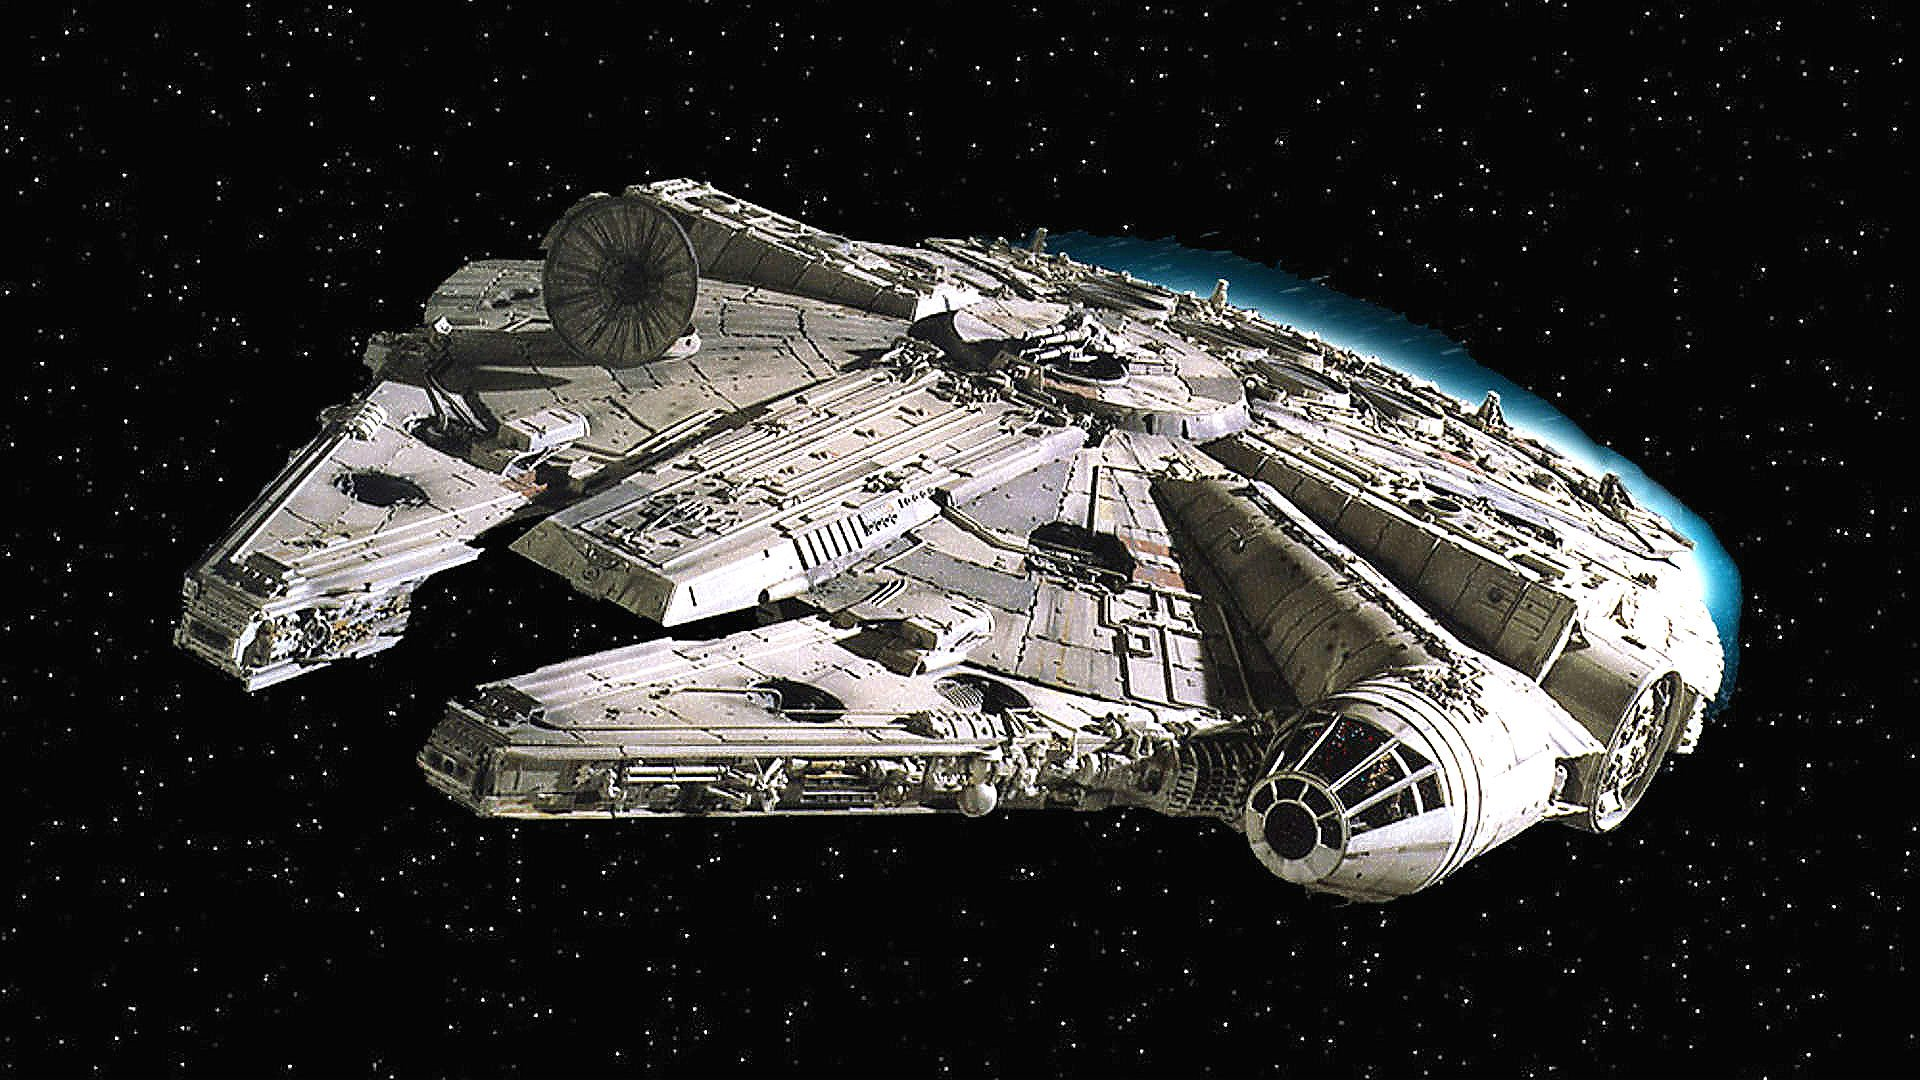 star wars force awakens action adventure sci fi disney spaceship wallpaper 1920x1080 533542. Black Bedroom Furniture Sets. Home Design Ideas